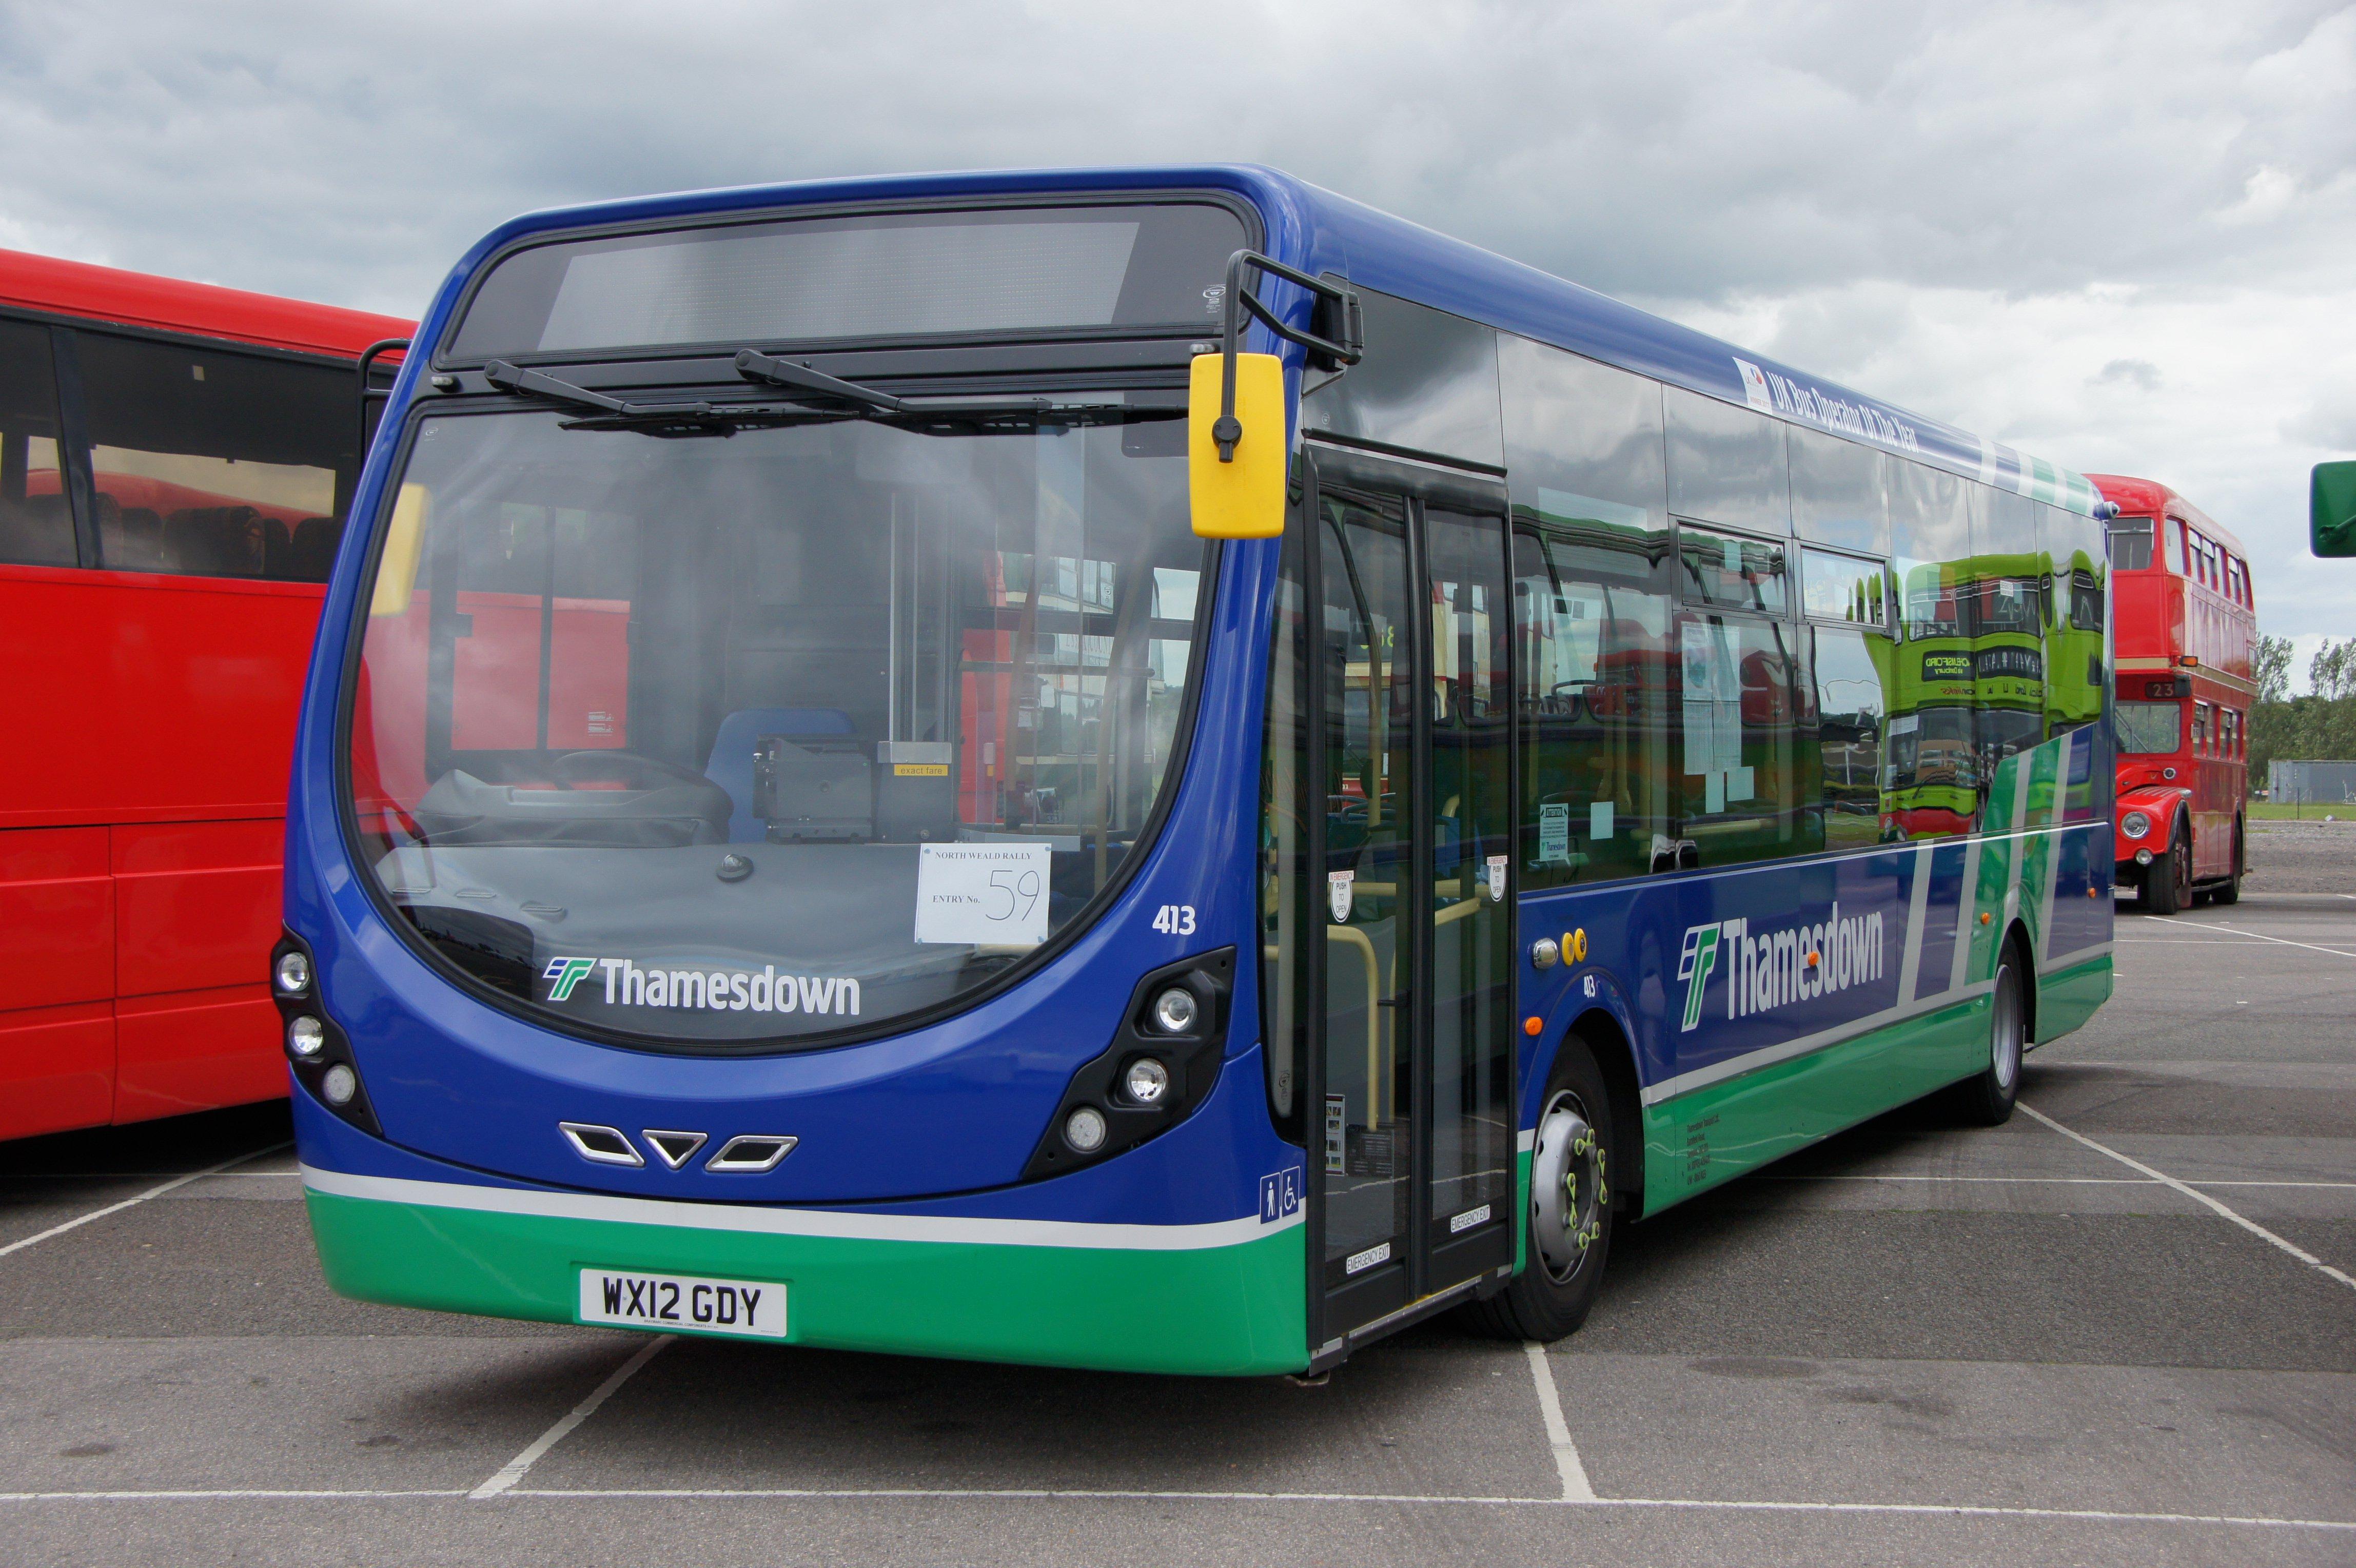 key_Thamesdown_bus_413_(WX12_GDY)__2012_North_Weald_bus_rally.jpg